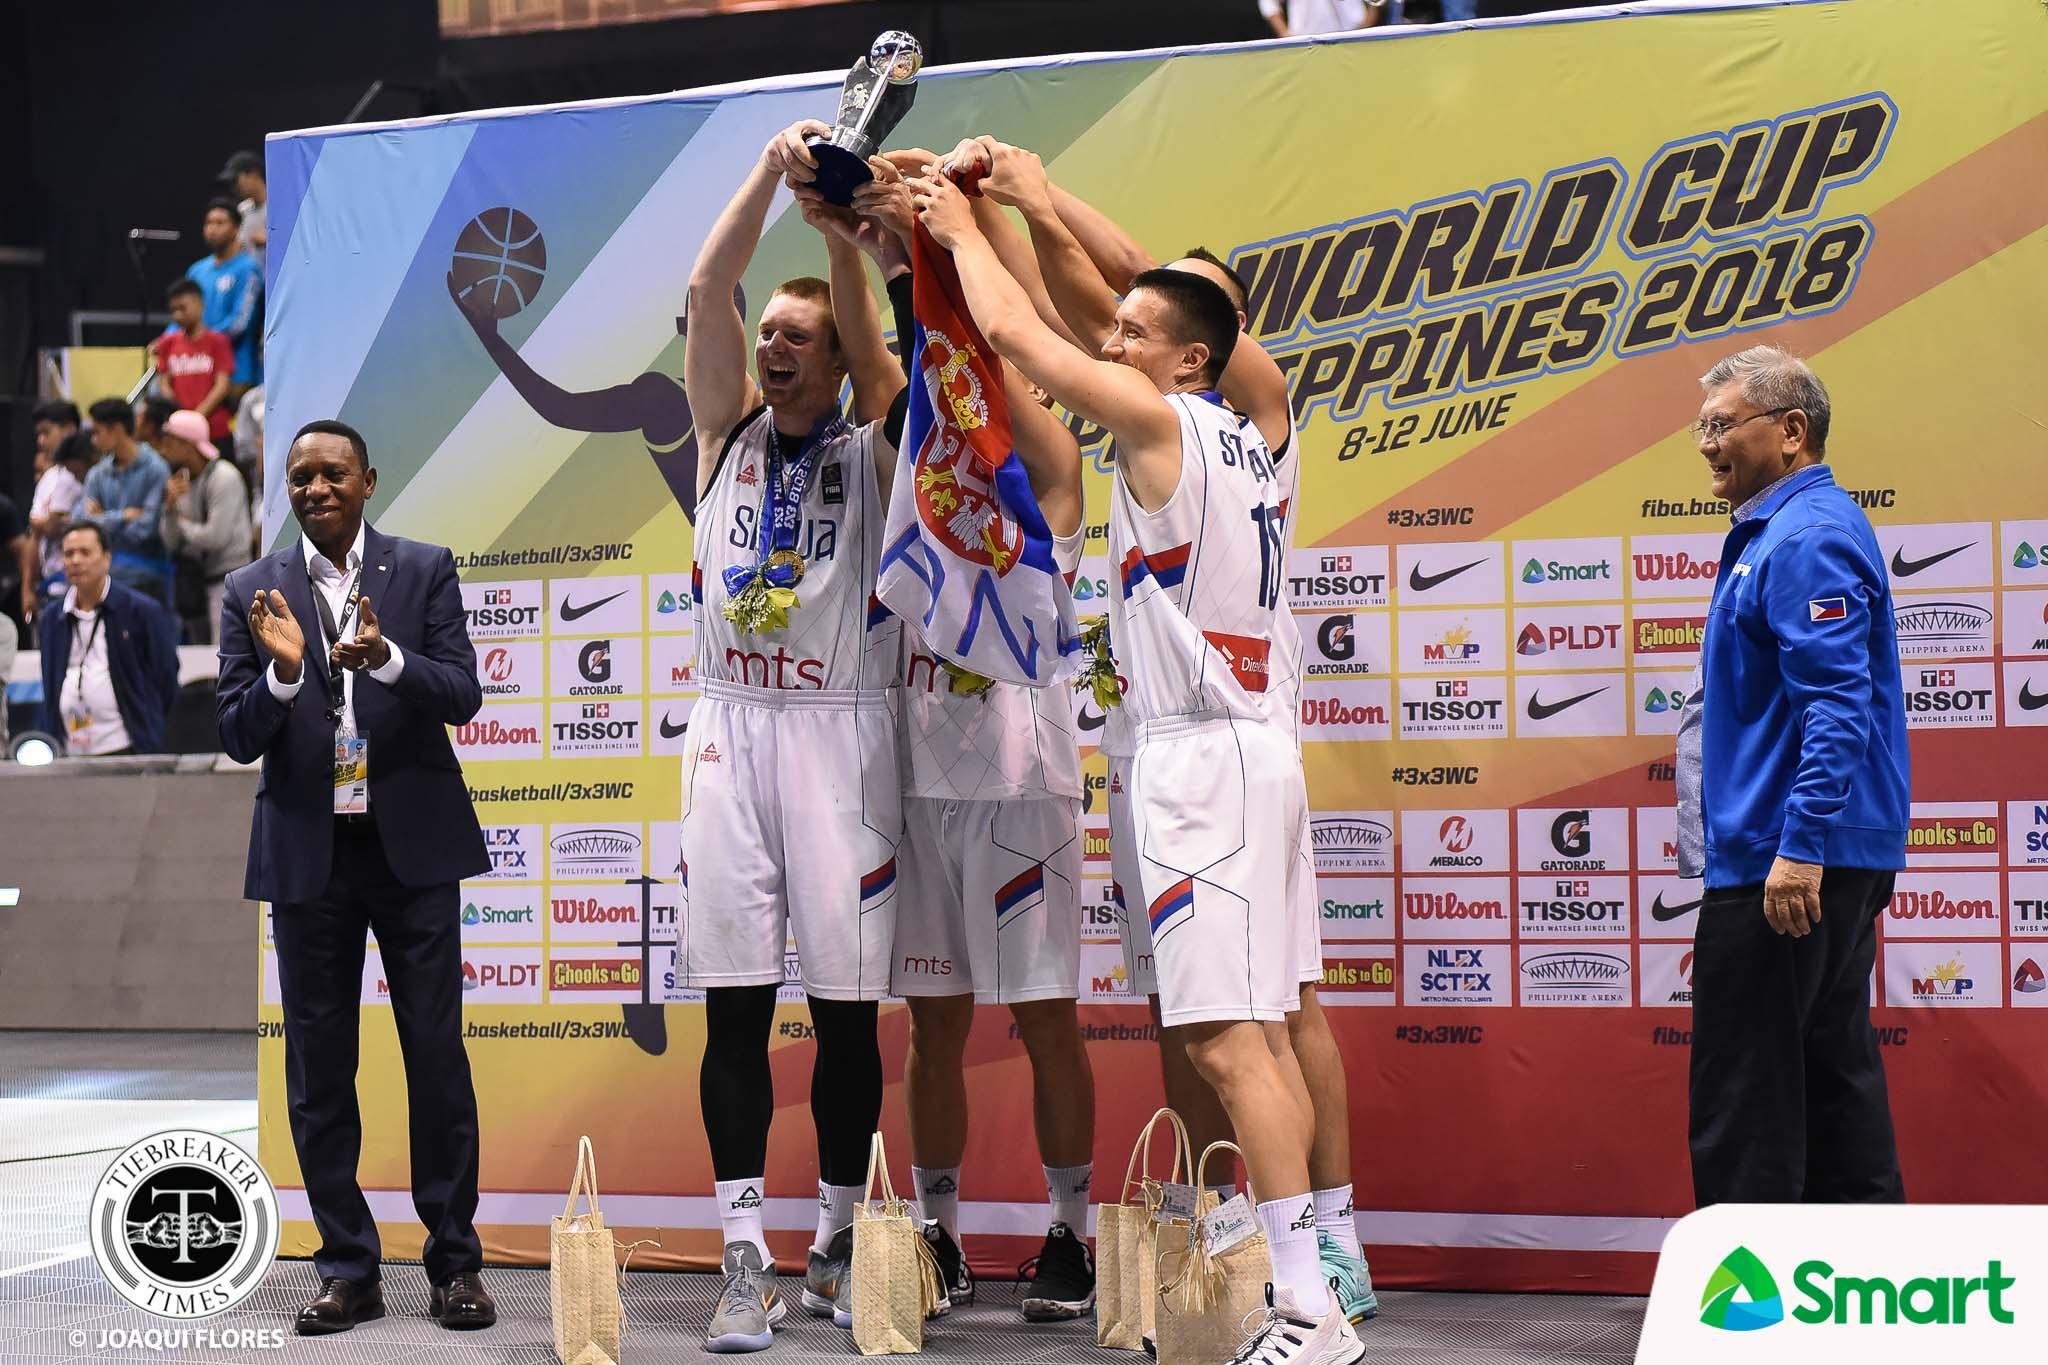 Tiebreaker Times Serbia's advice on Philippines' 3X3 program: 'They need to work hard' 2018 FIBA 3X3 World Cup 3x3 Basketball News  Serbia (Basketball) Dusan Bulut Dejan Majstorovic 2018 FIBA 3X3 World Cup - Men's